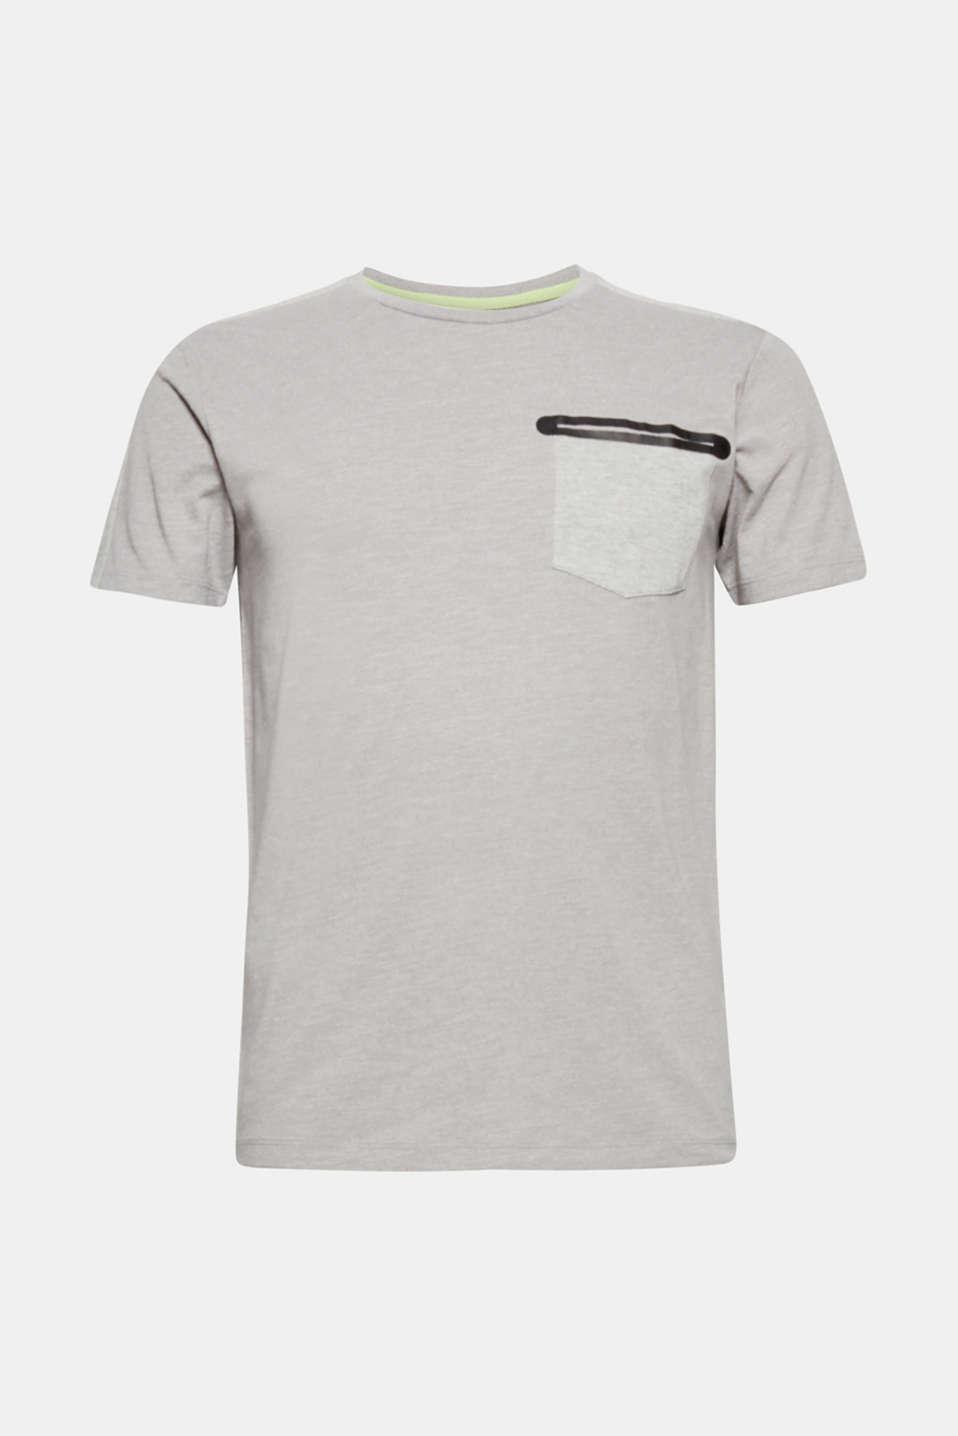 T-Shirts, LIGHT GREY, detail image number 6